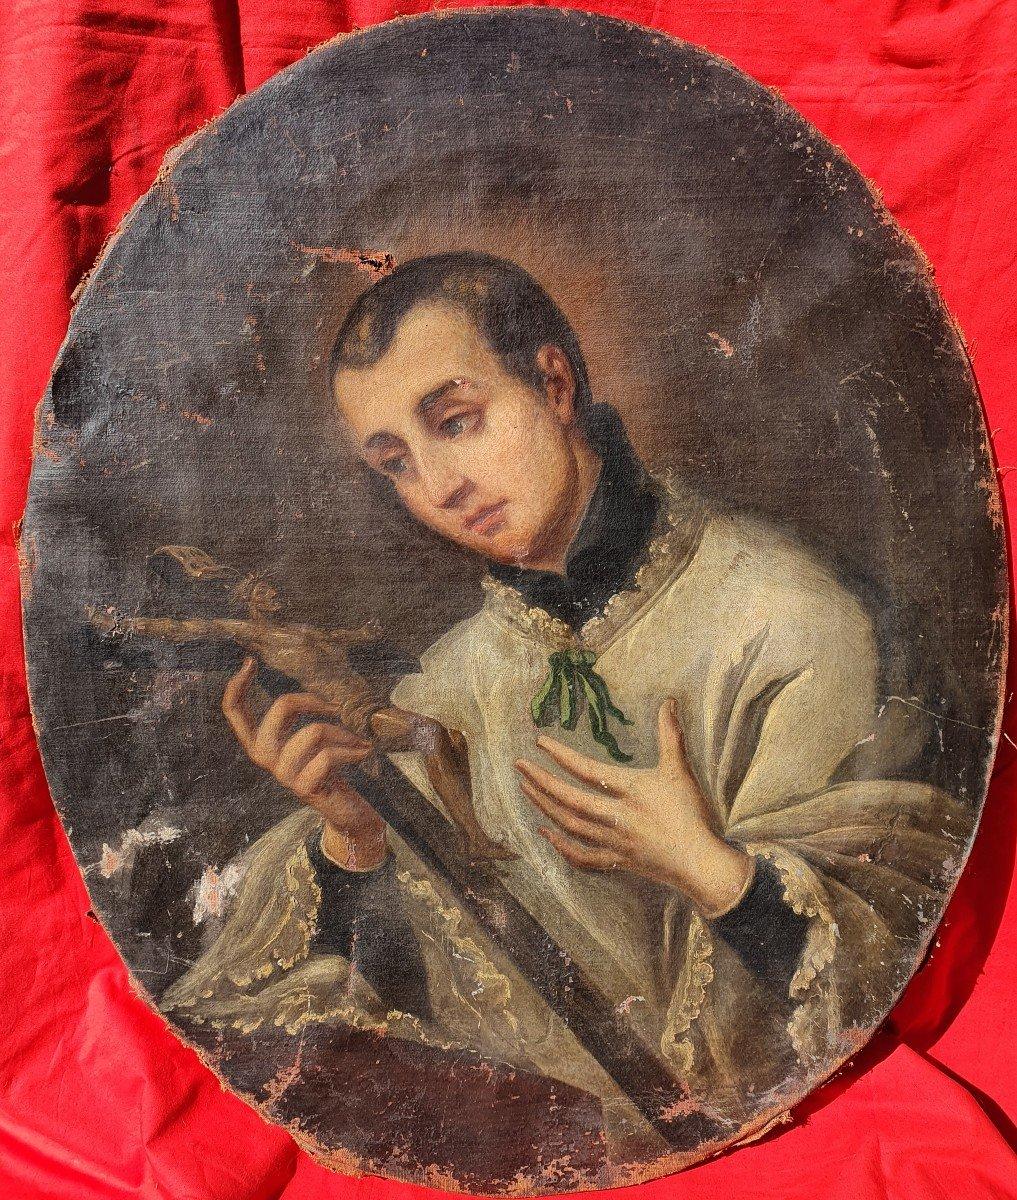 Large Religious Portrait Young Priest Contemplation Crucifix 17th - 18th